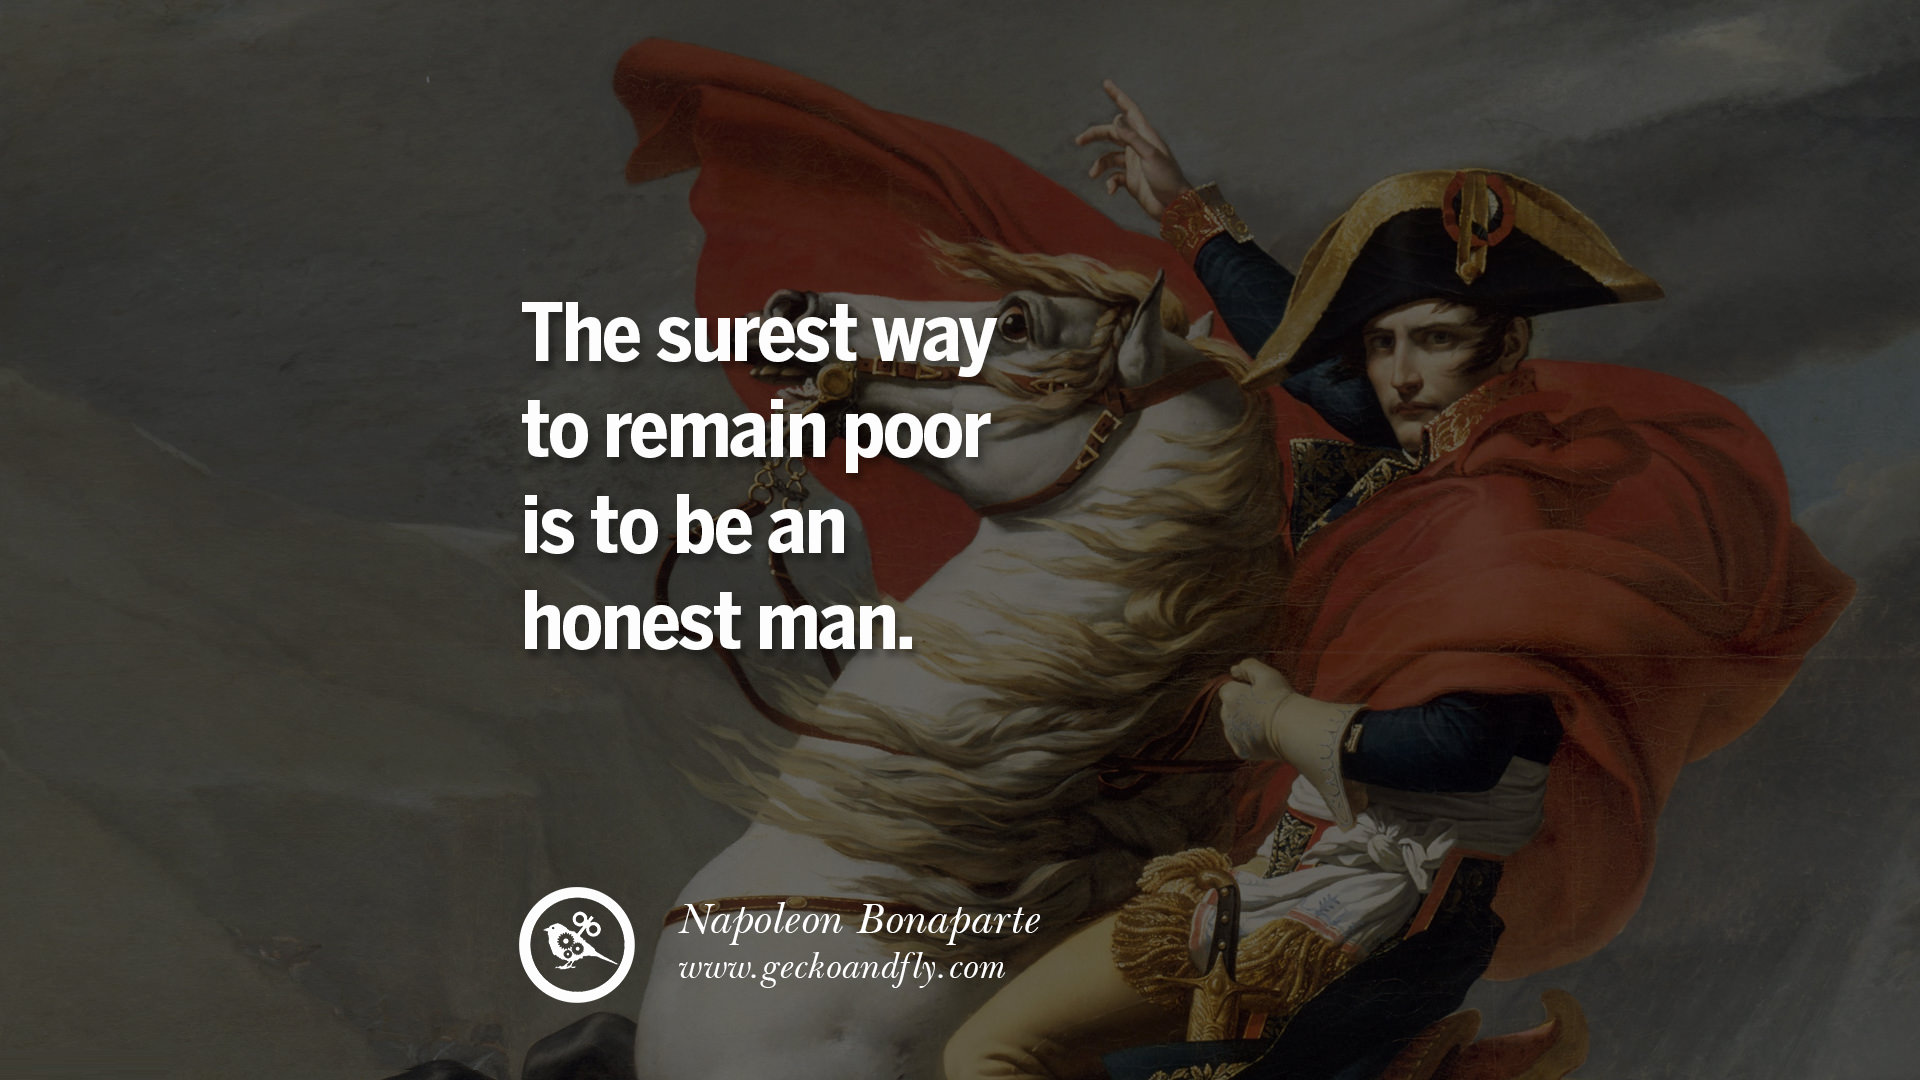 cause of napoleon bonapartes death essay Napoleon bonapartes successes and downfall history essay napoleon bonaparte was born on if you are the original writer of this essay and no longer wish.